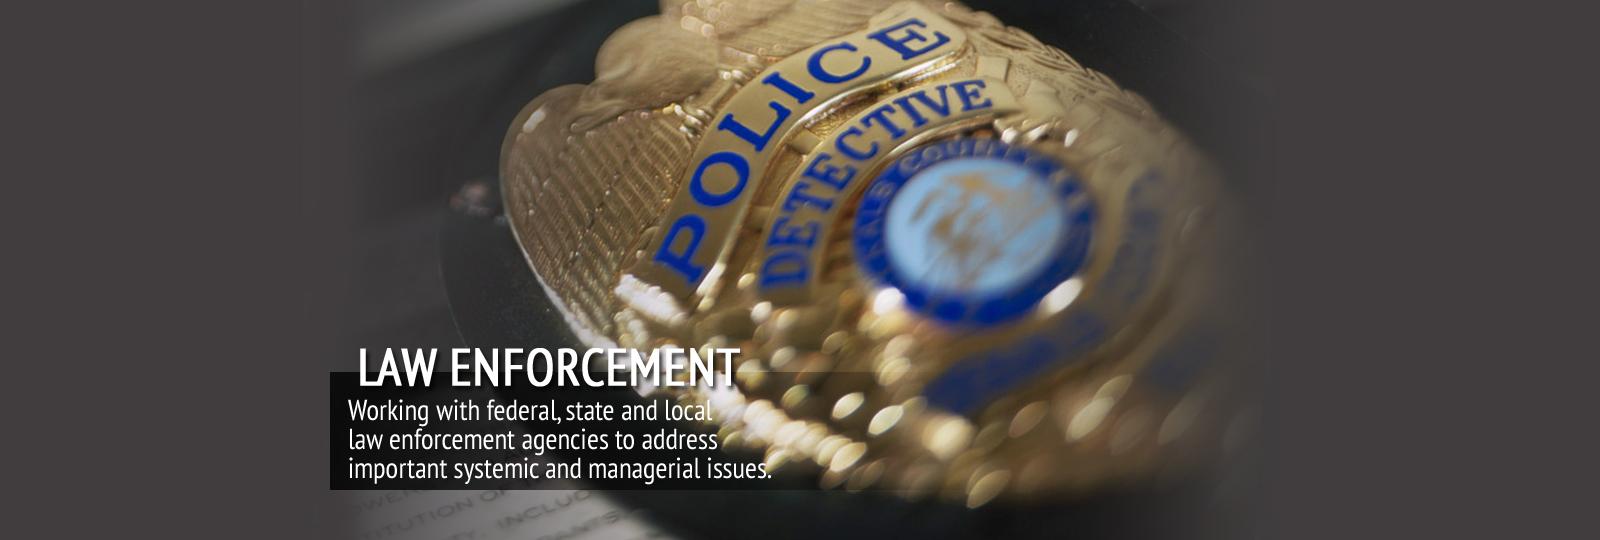 Slide 6 – Law Enforcement